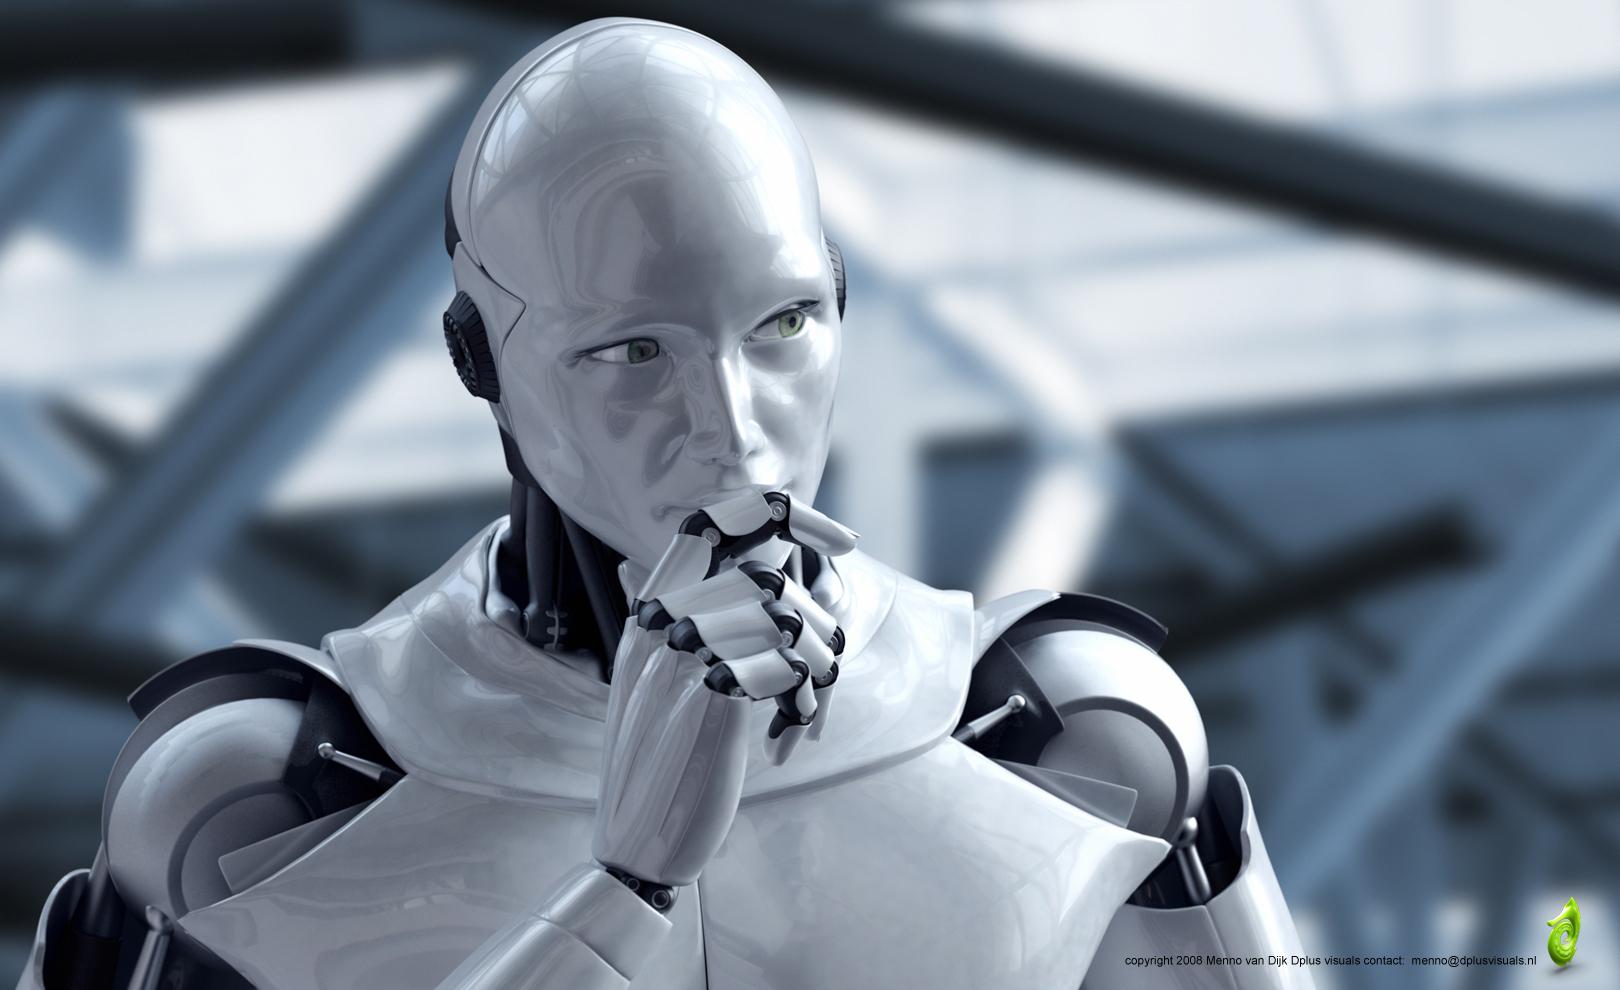 عالیملری روبوتلار اوچون یئنی تکنولوژی یاراتدیلار